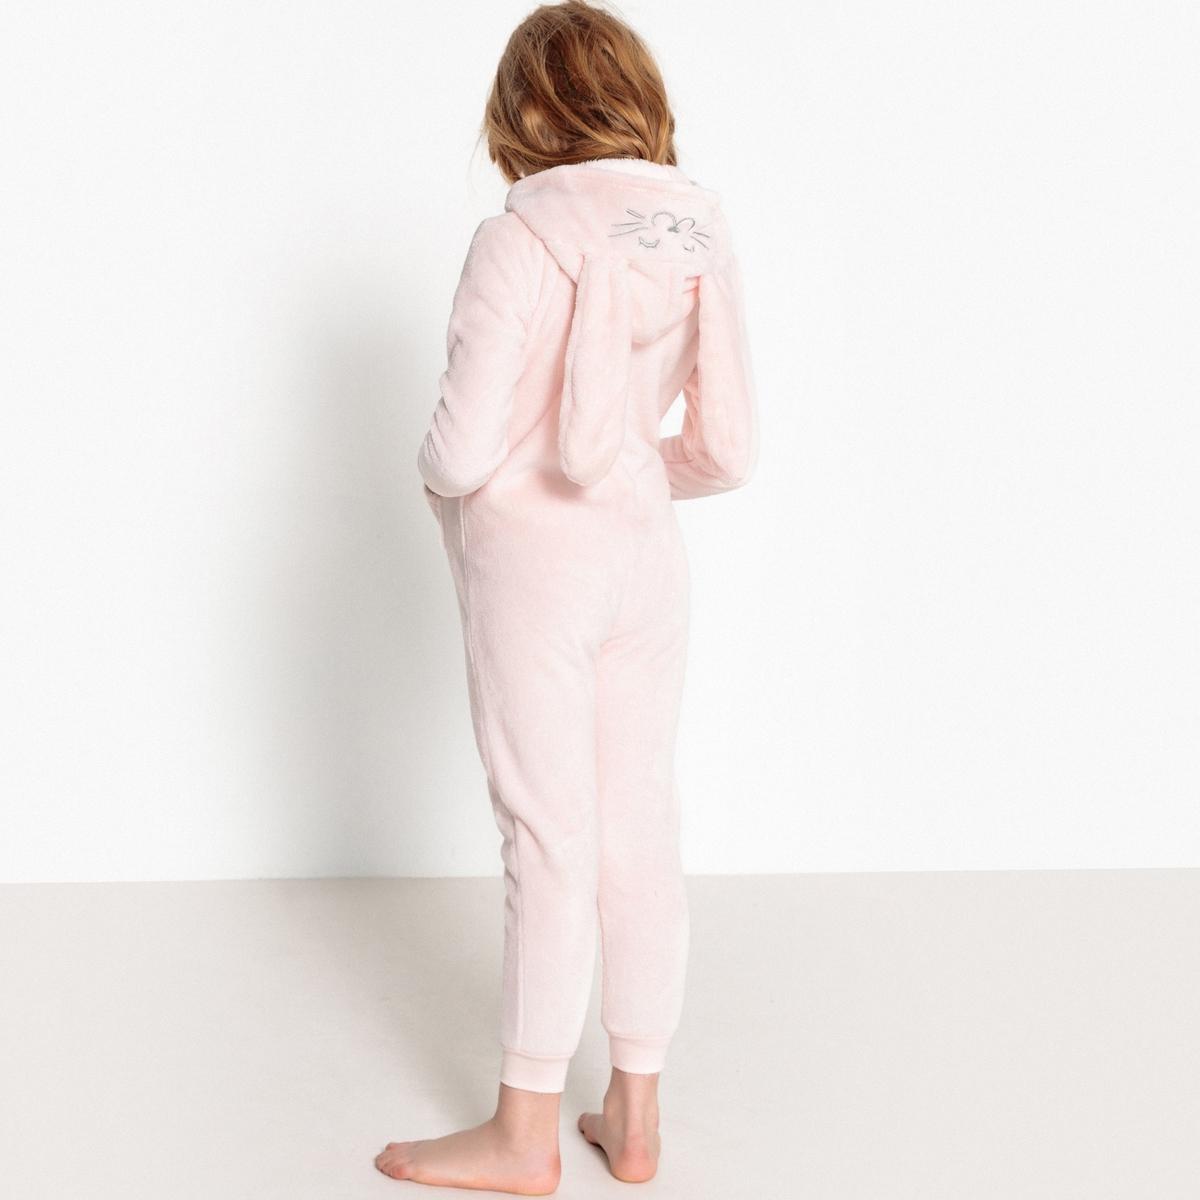 Пижама La Redoute Цельная с рисунком кролик 12 лет -150 см розовый пижама la redoute из предметов с рисунком 12 лет 150 см розовый